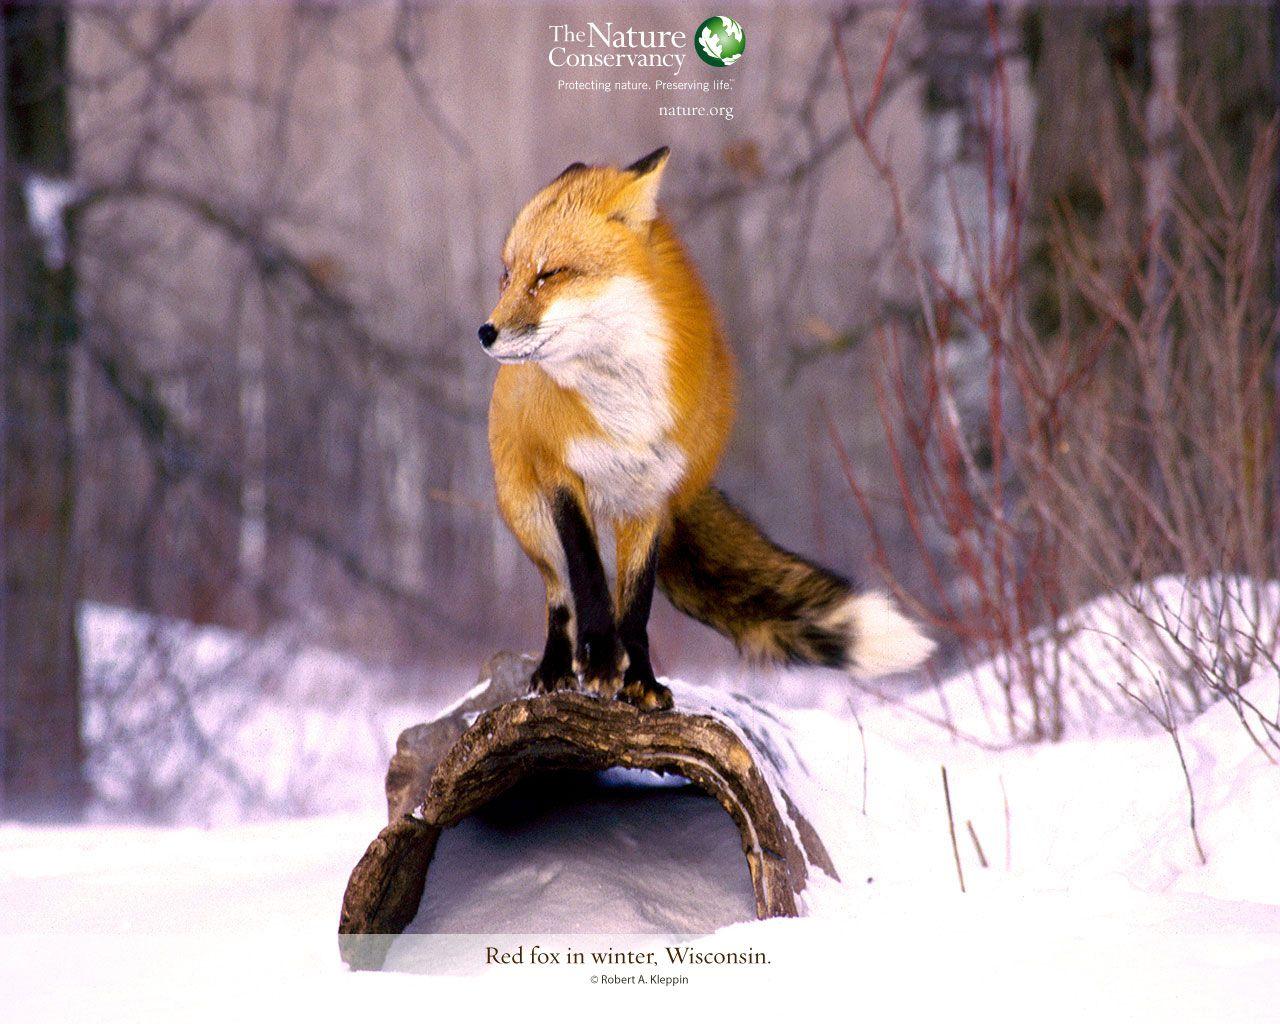 Decorate Your Desktop Decorate Your Desktop With Our Favorite Desktop Wallpapers The Nature Conservancy Animals Wild Animals Beautiful Fox